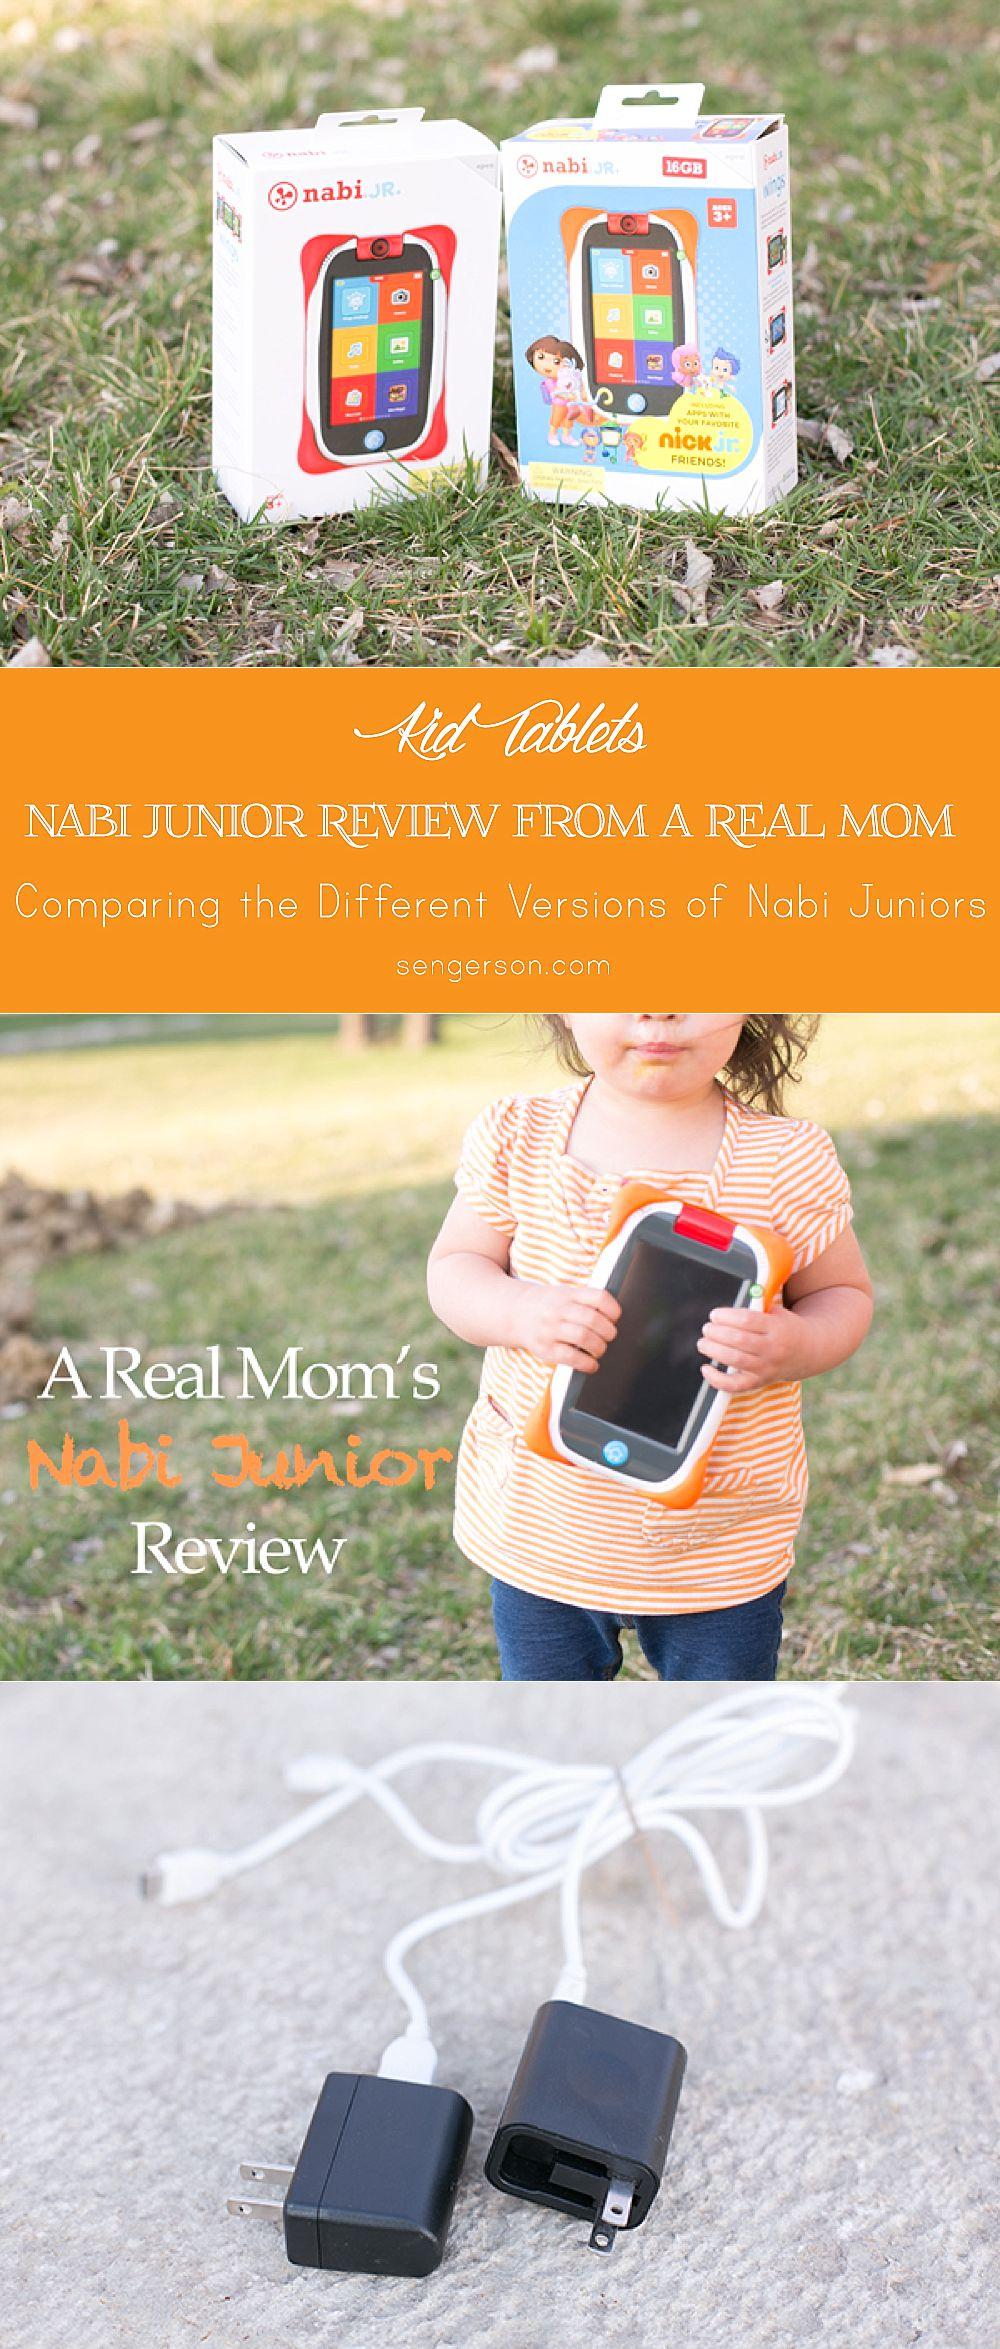 Nabi jr 16gb review - Dallas window tinting